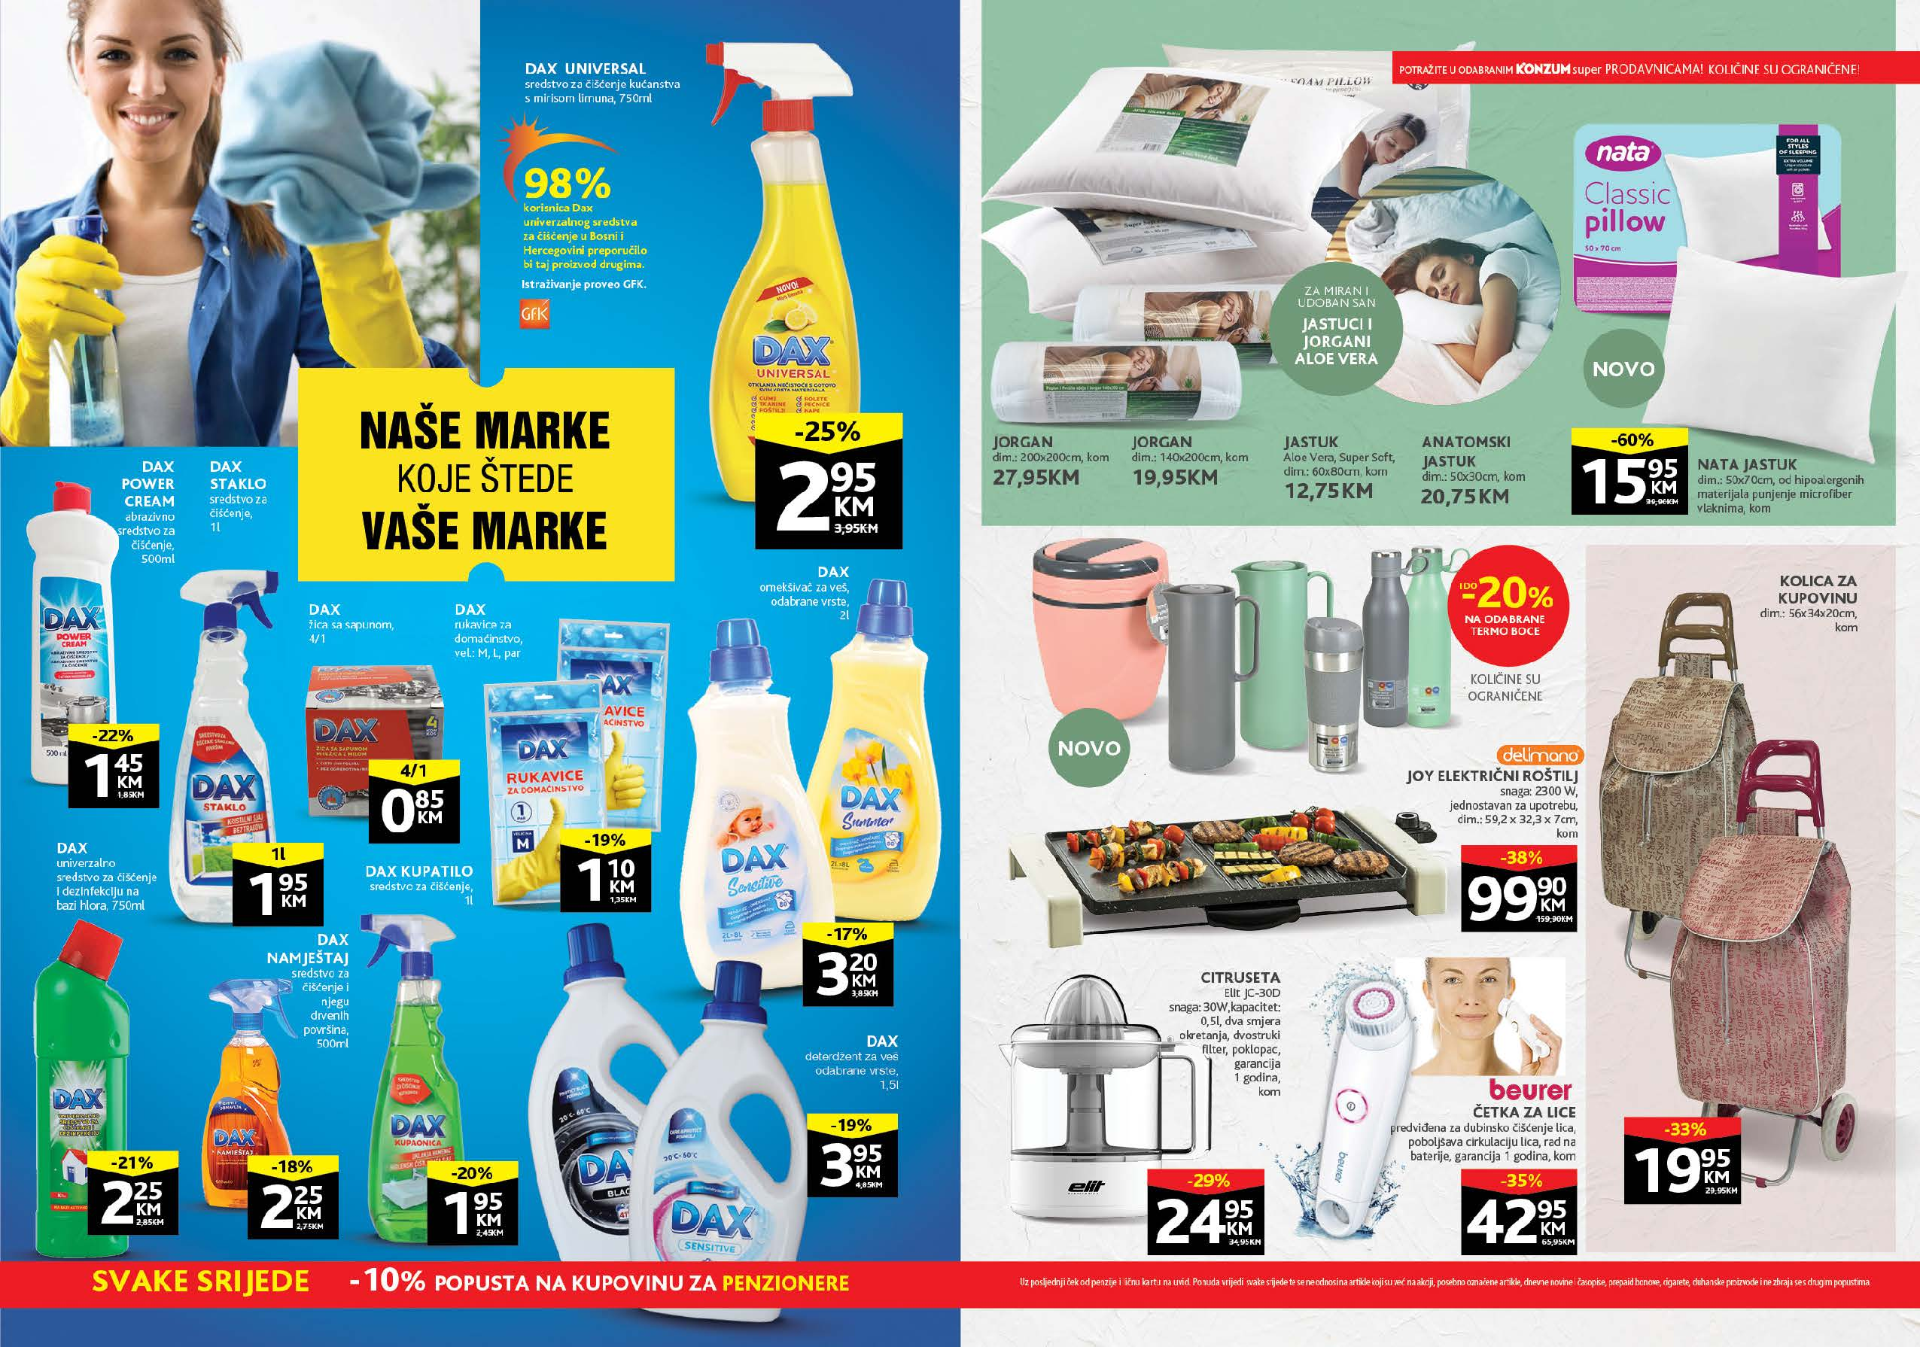 KONZUM Katalog Redovni katalog JUL 2021 5.7.2021. 15.7.2021. Page 13